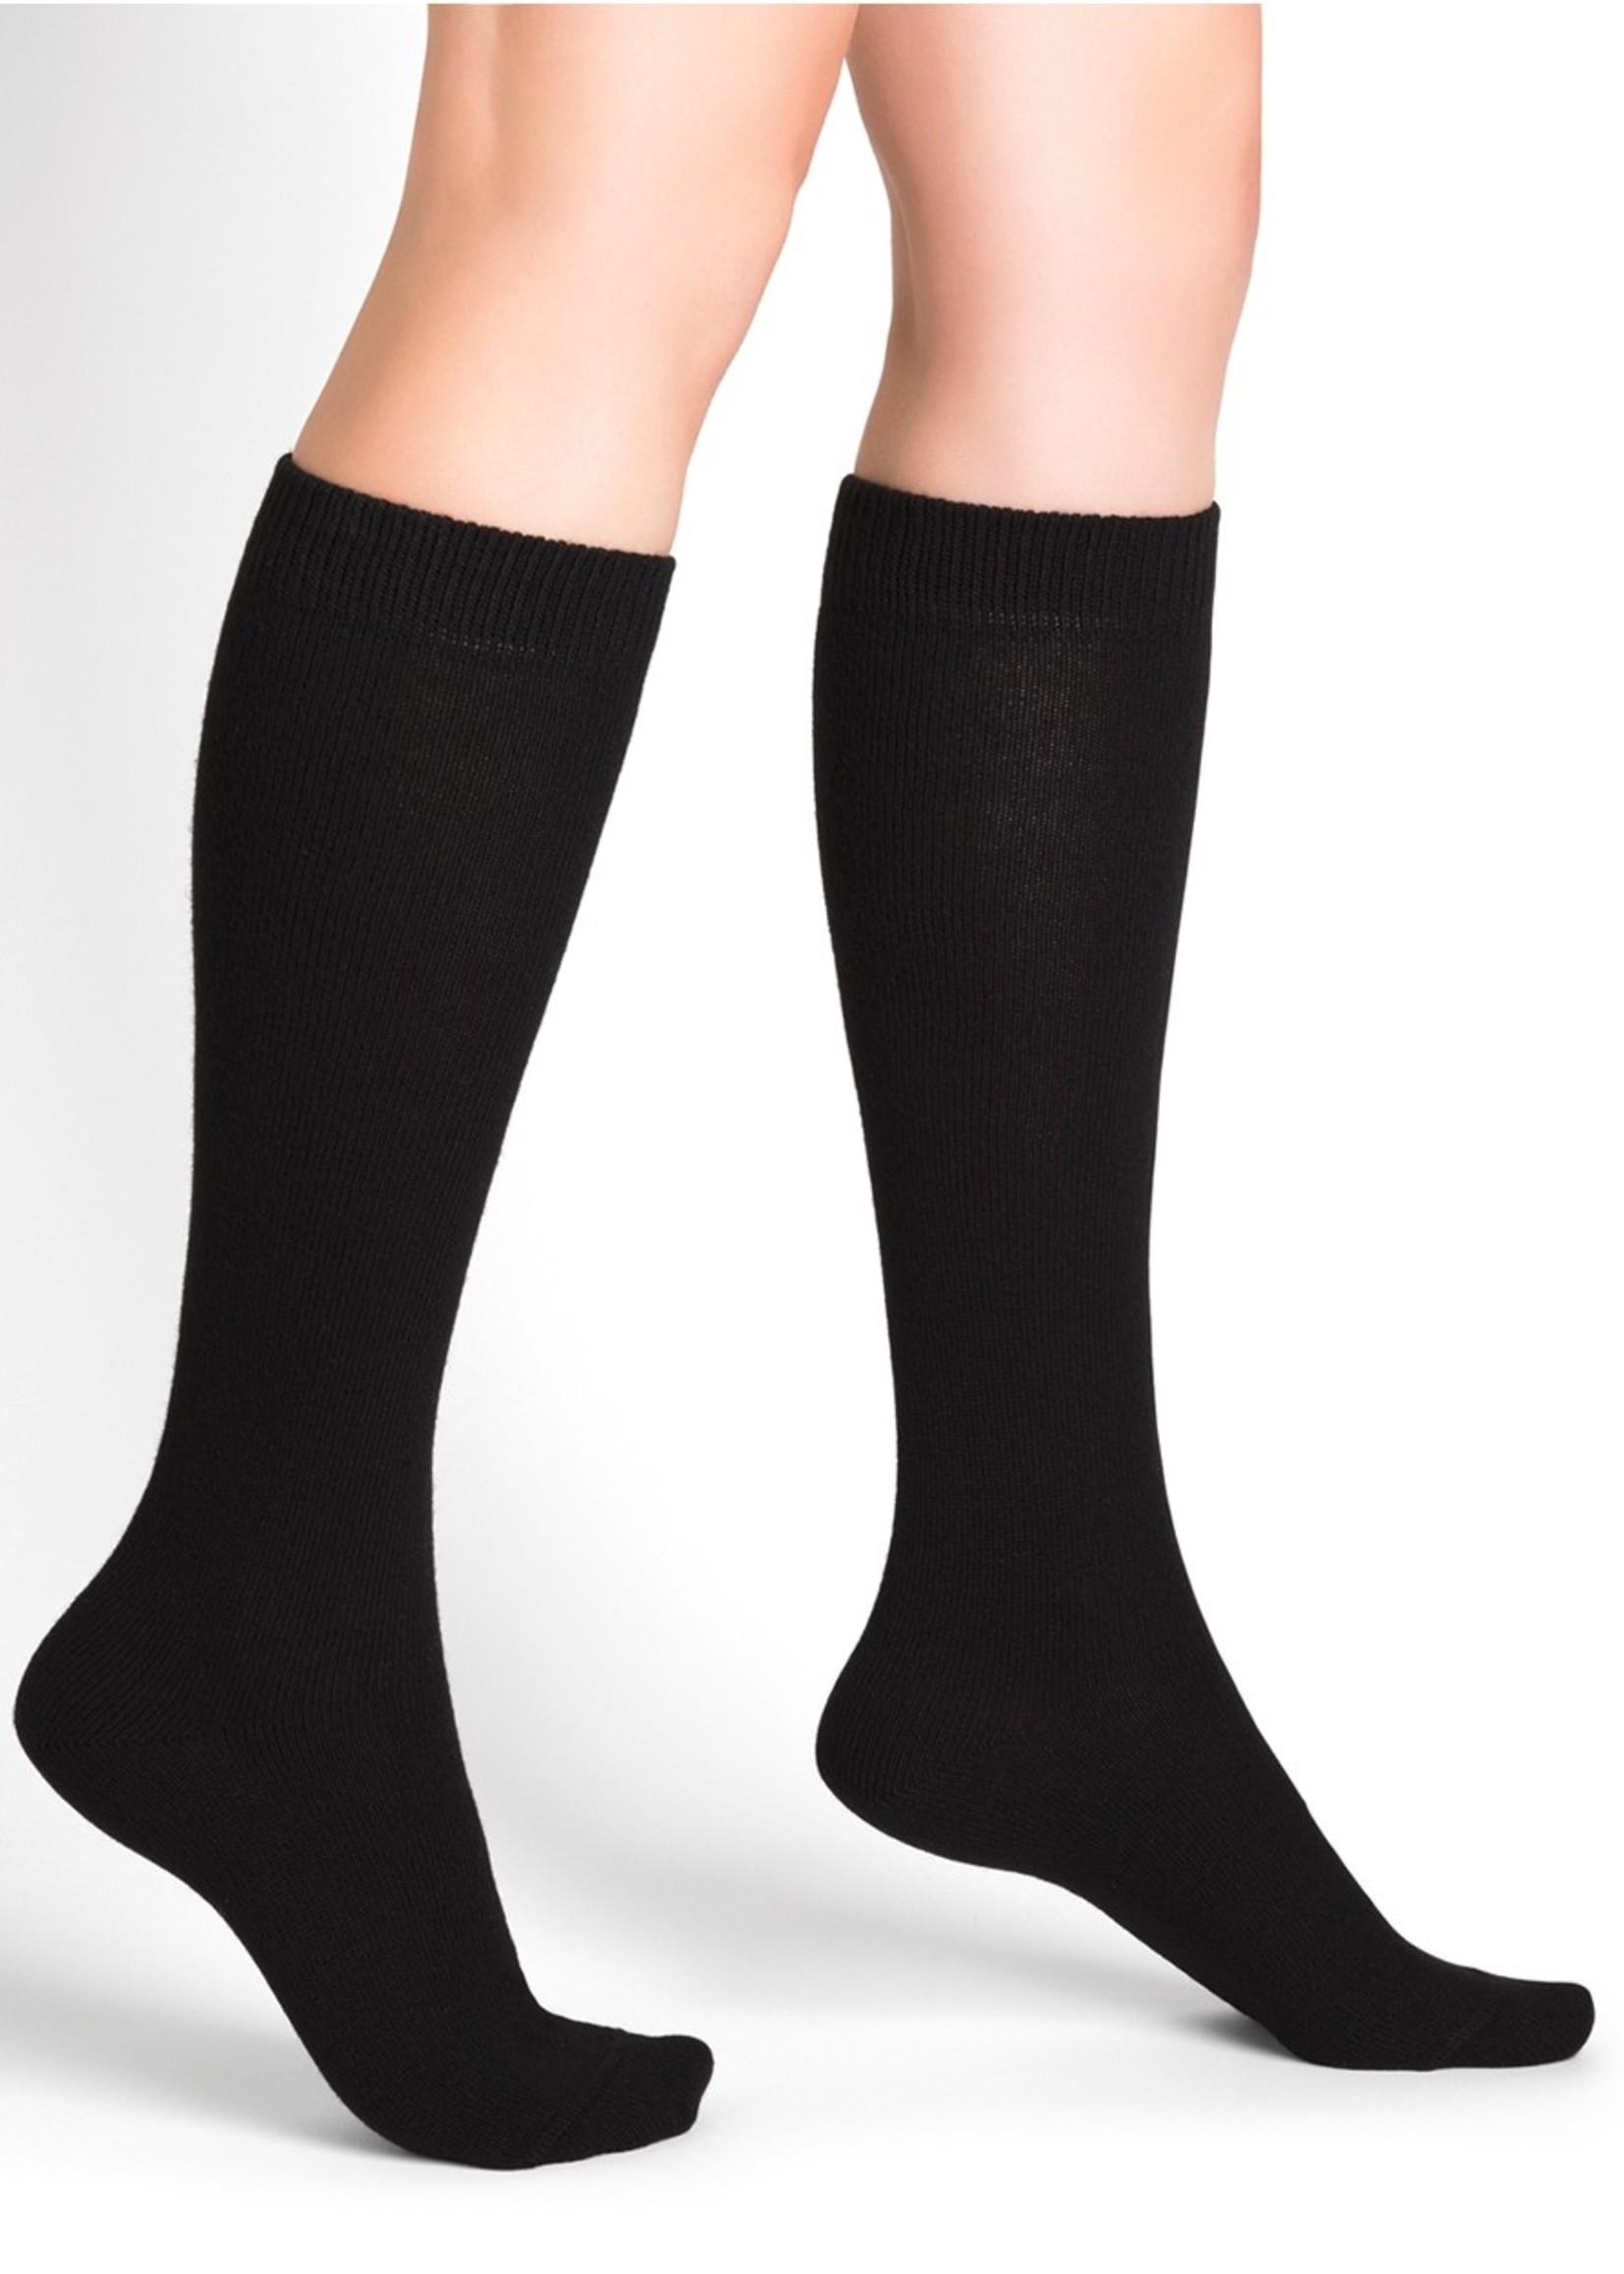 Bleuforet Cashmere Knee High Socks